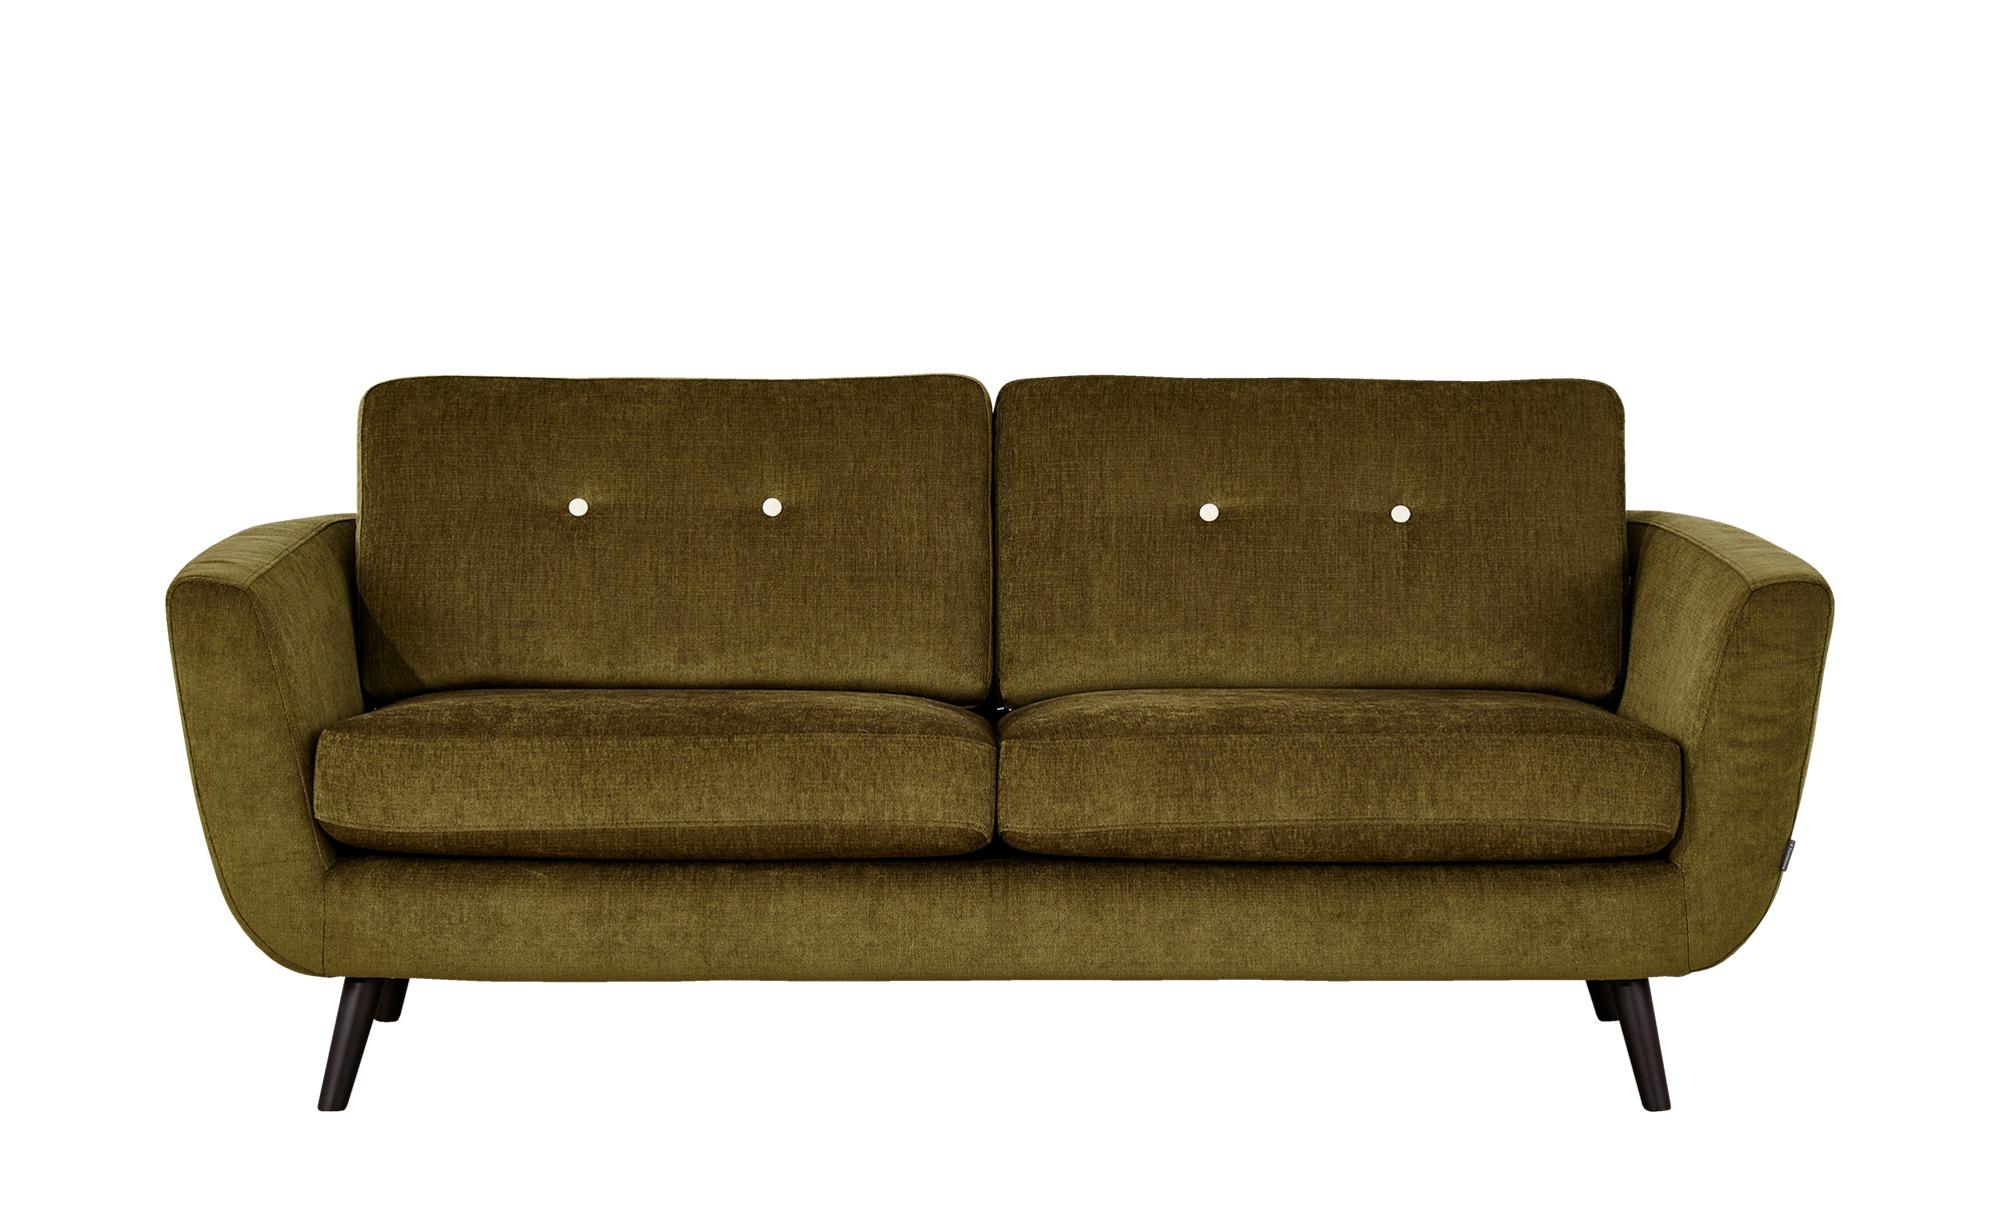 Sofa Smilla Sofa Gunstige Sofas Big Sofa Kaufen